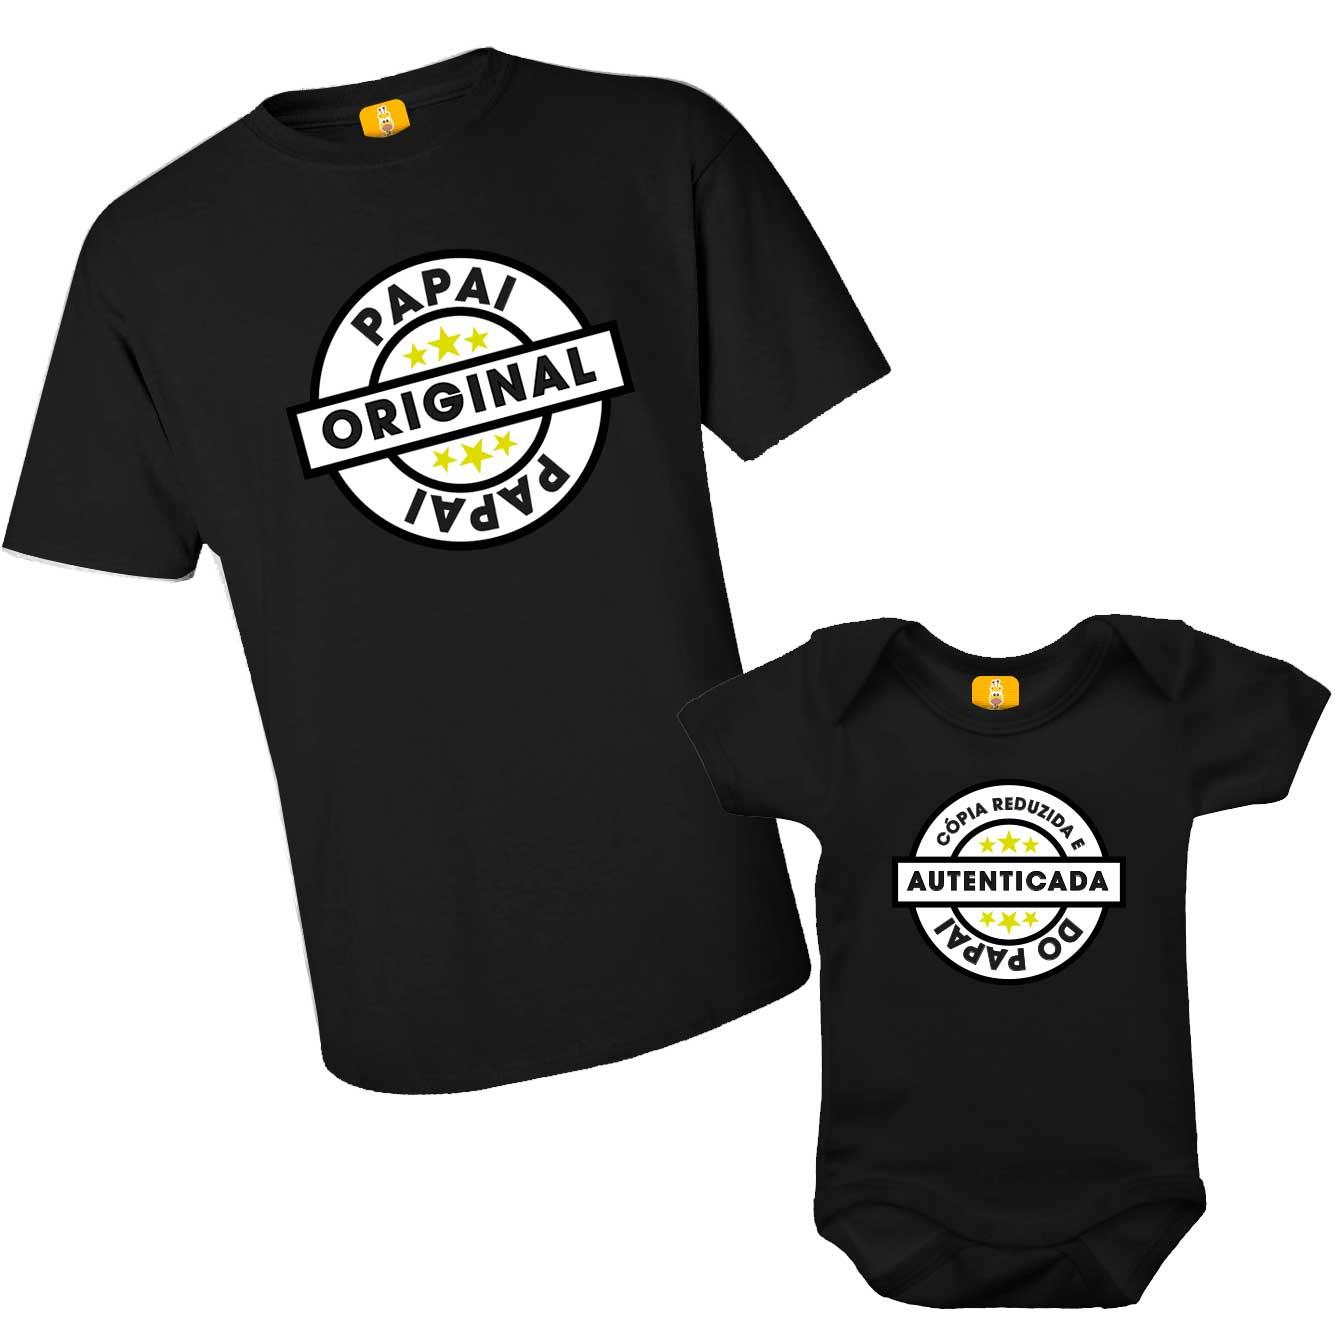 Kit Body e Camiseta Tal Pai Tal Filho - Original e Cópia Autenticada